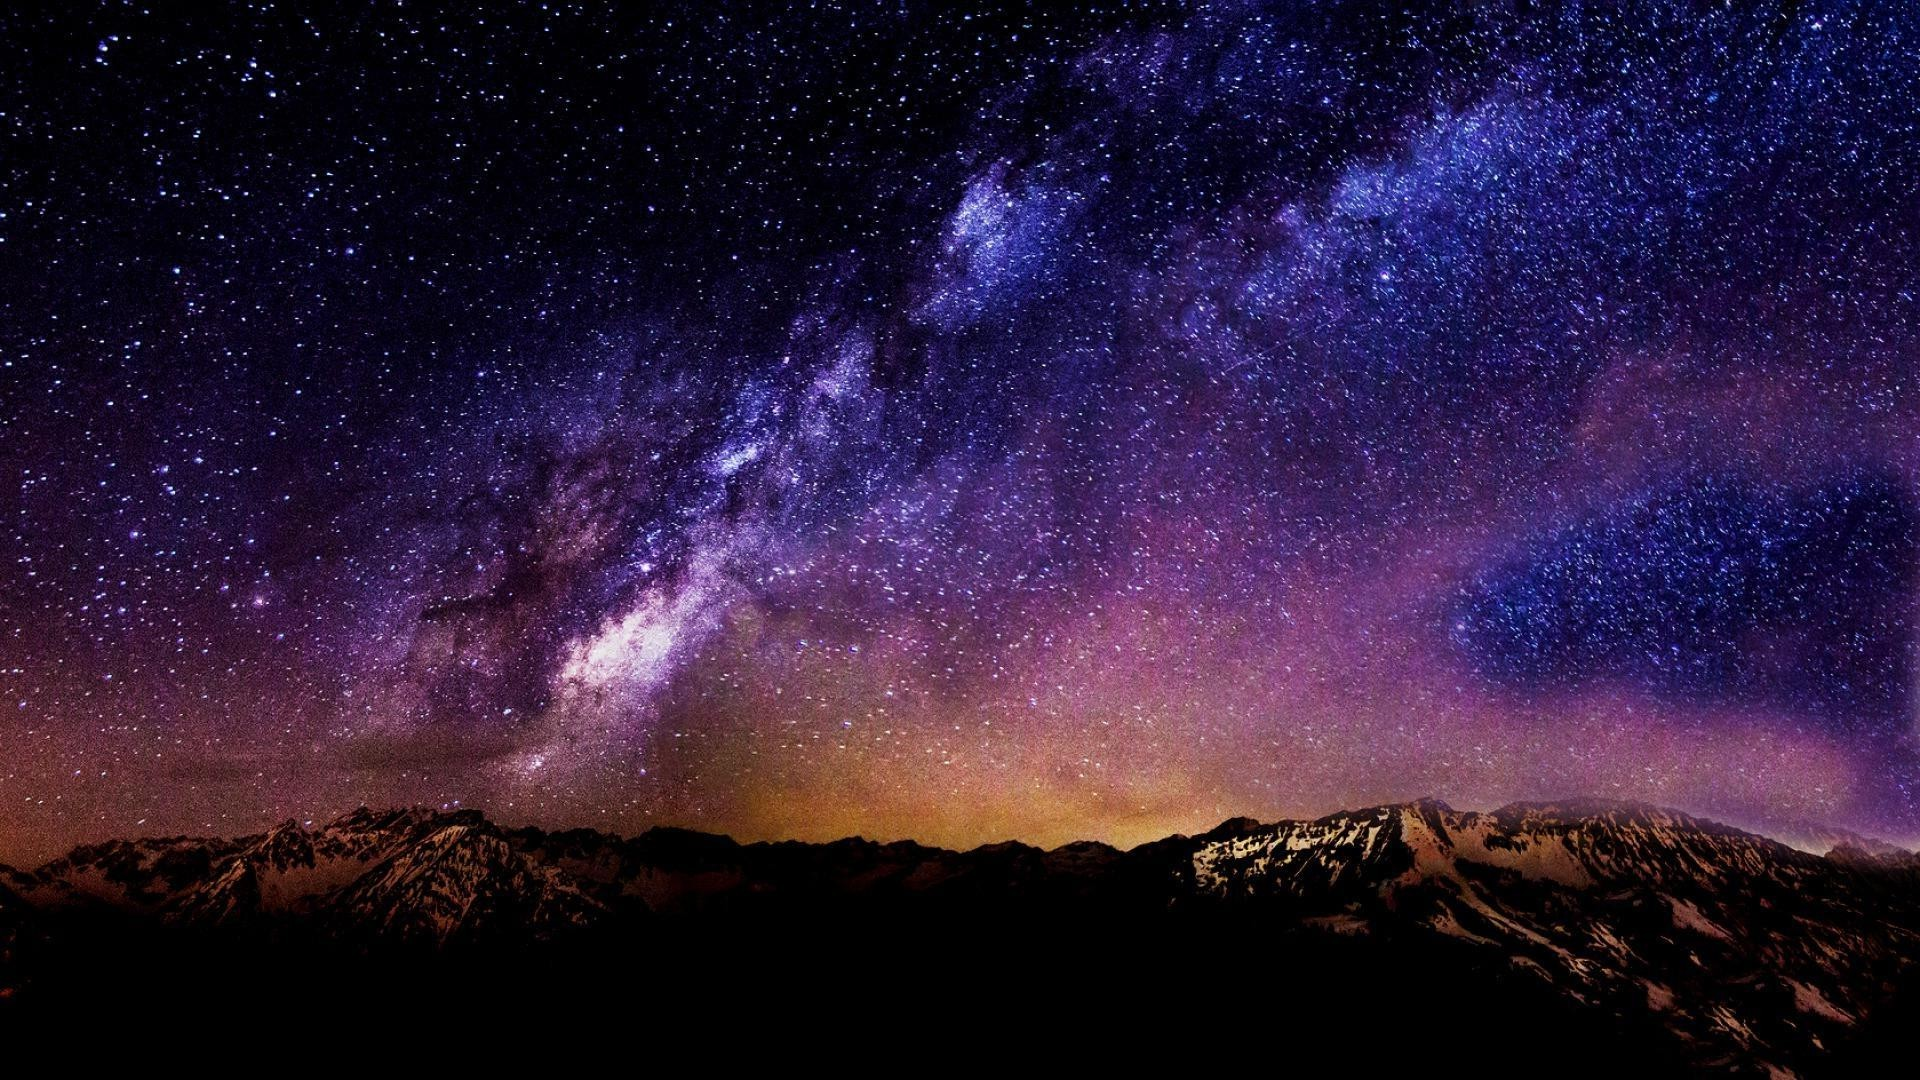 Starry Night Sky HD desktop wallpaper : High Definition .